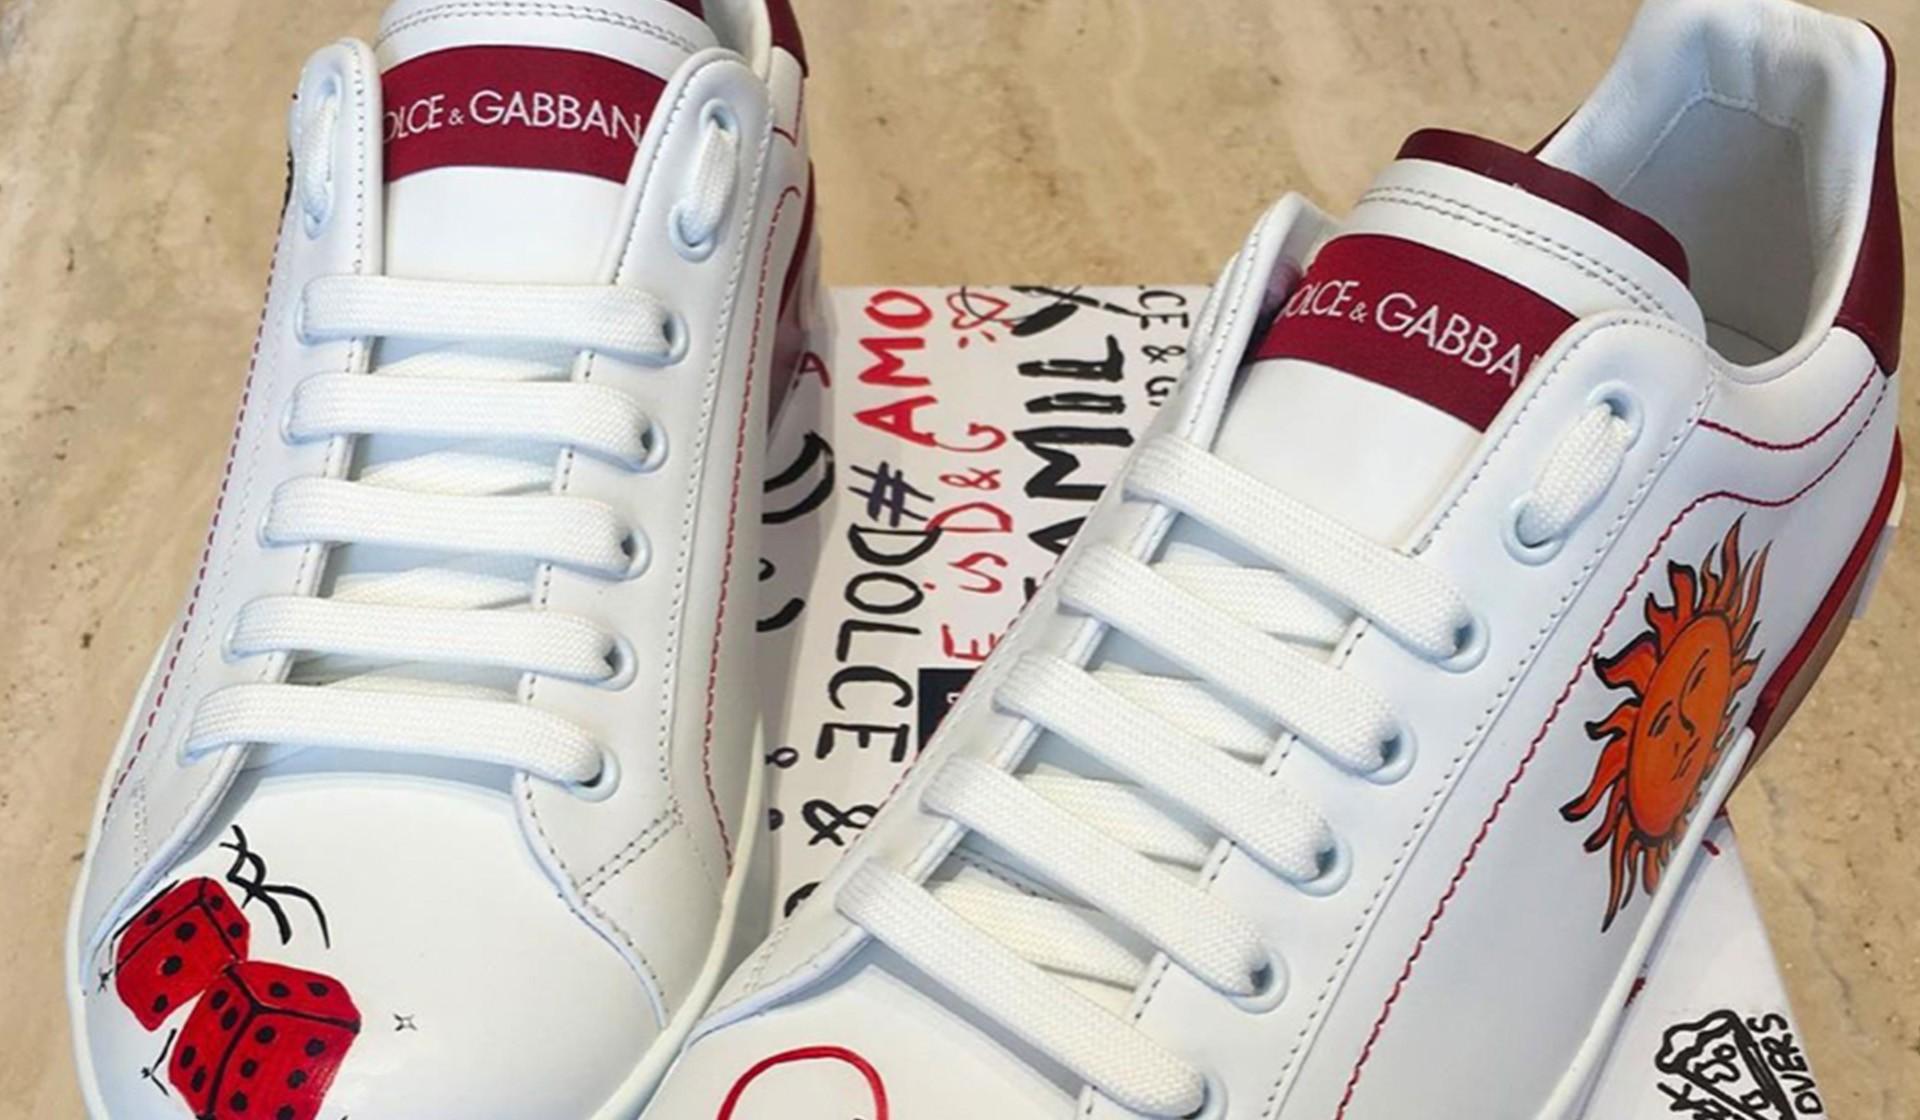 Dolce \u0026 Gabbana invites you to discover